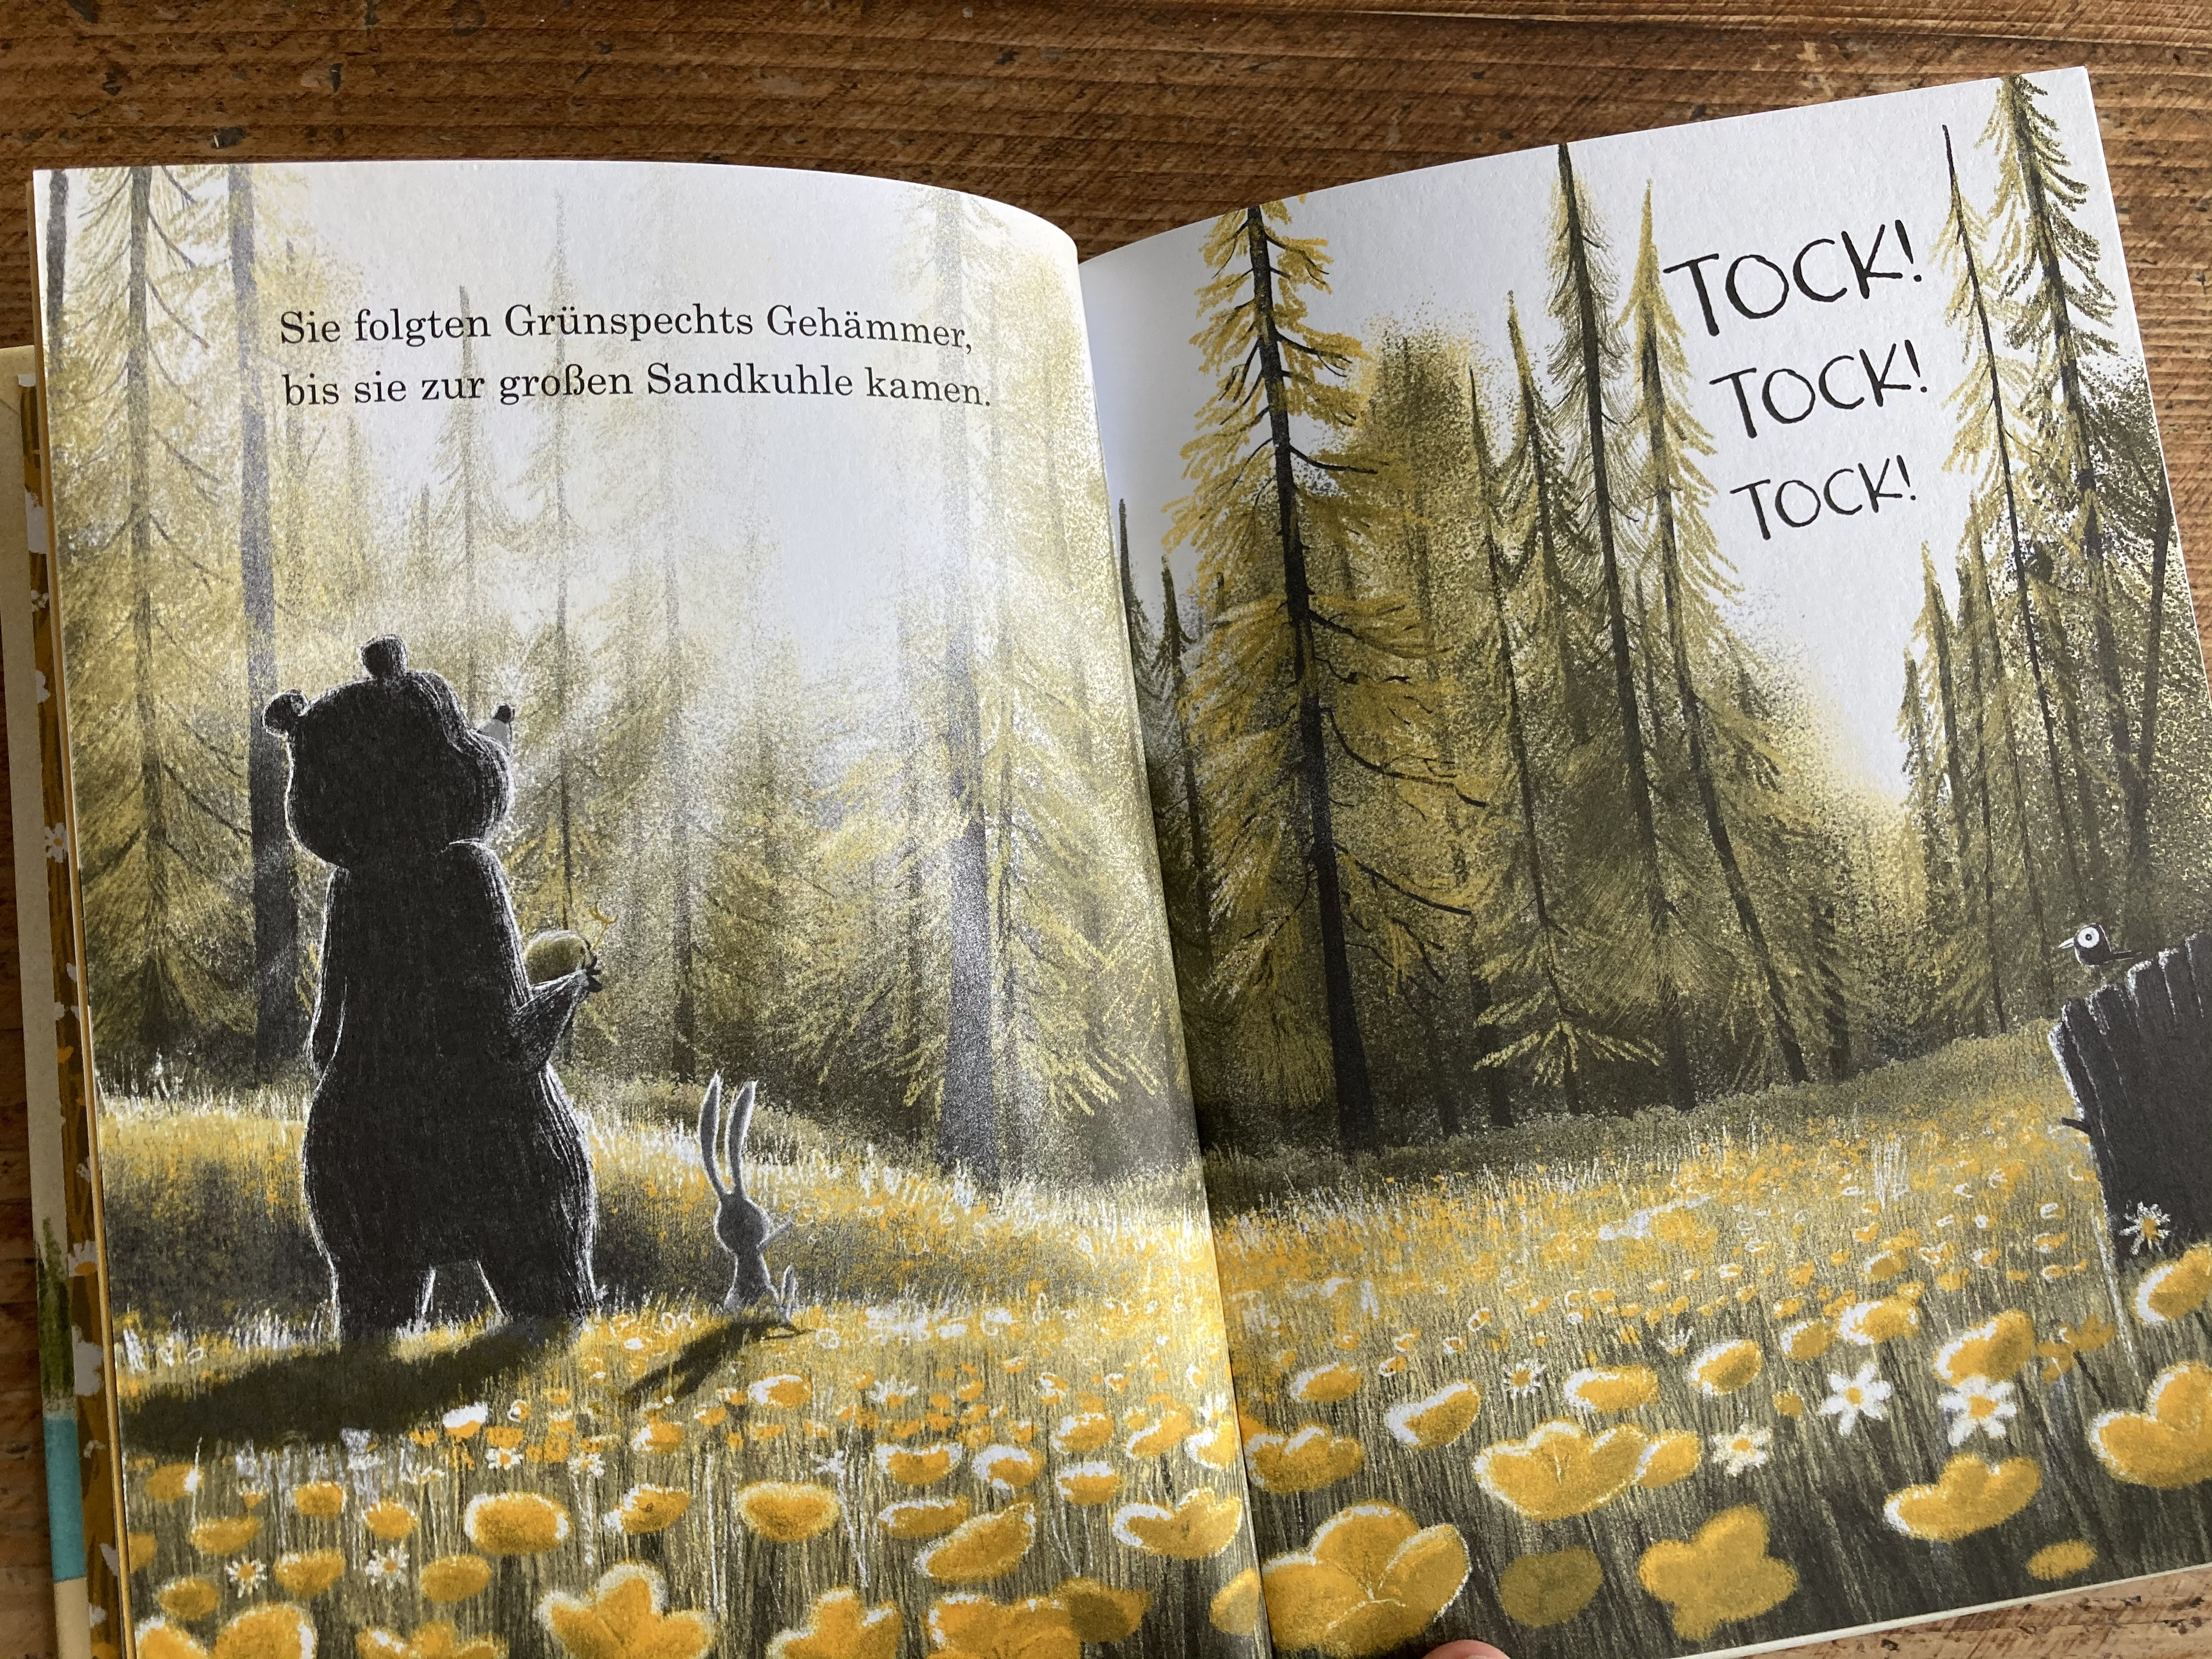 Julian Gough, Jim Field, Magellan, vorlesen, Kinderbuch